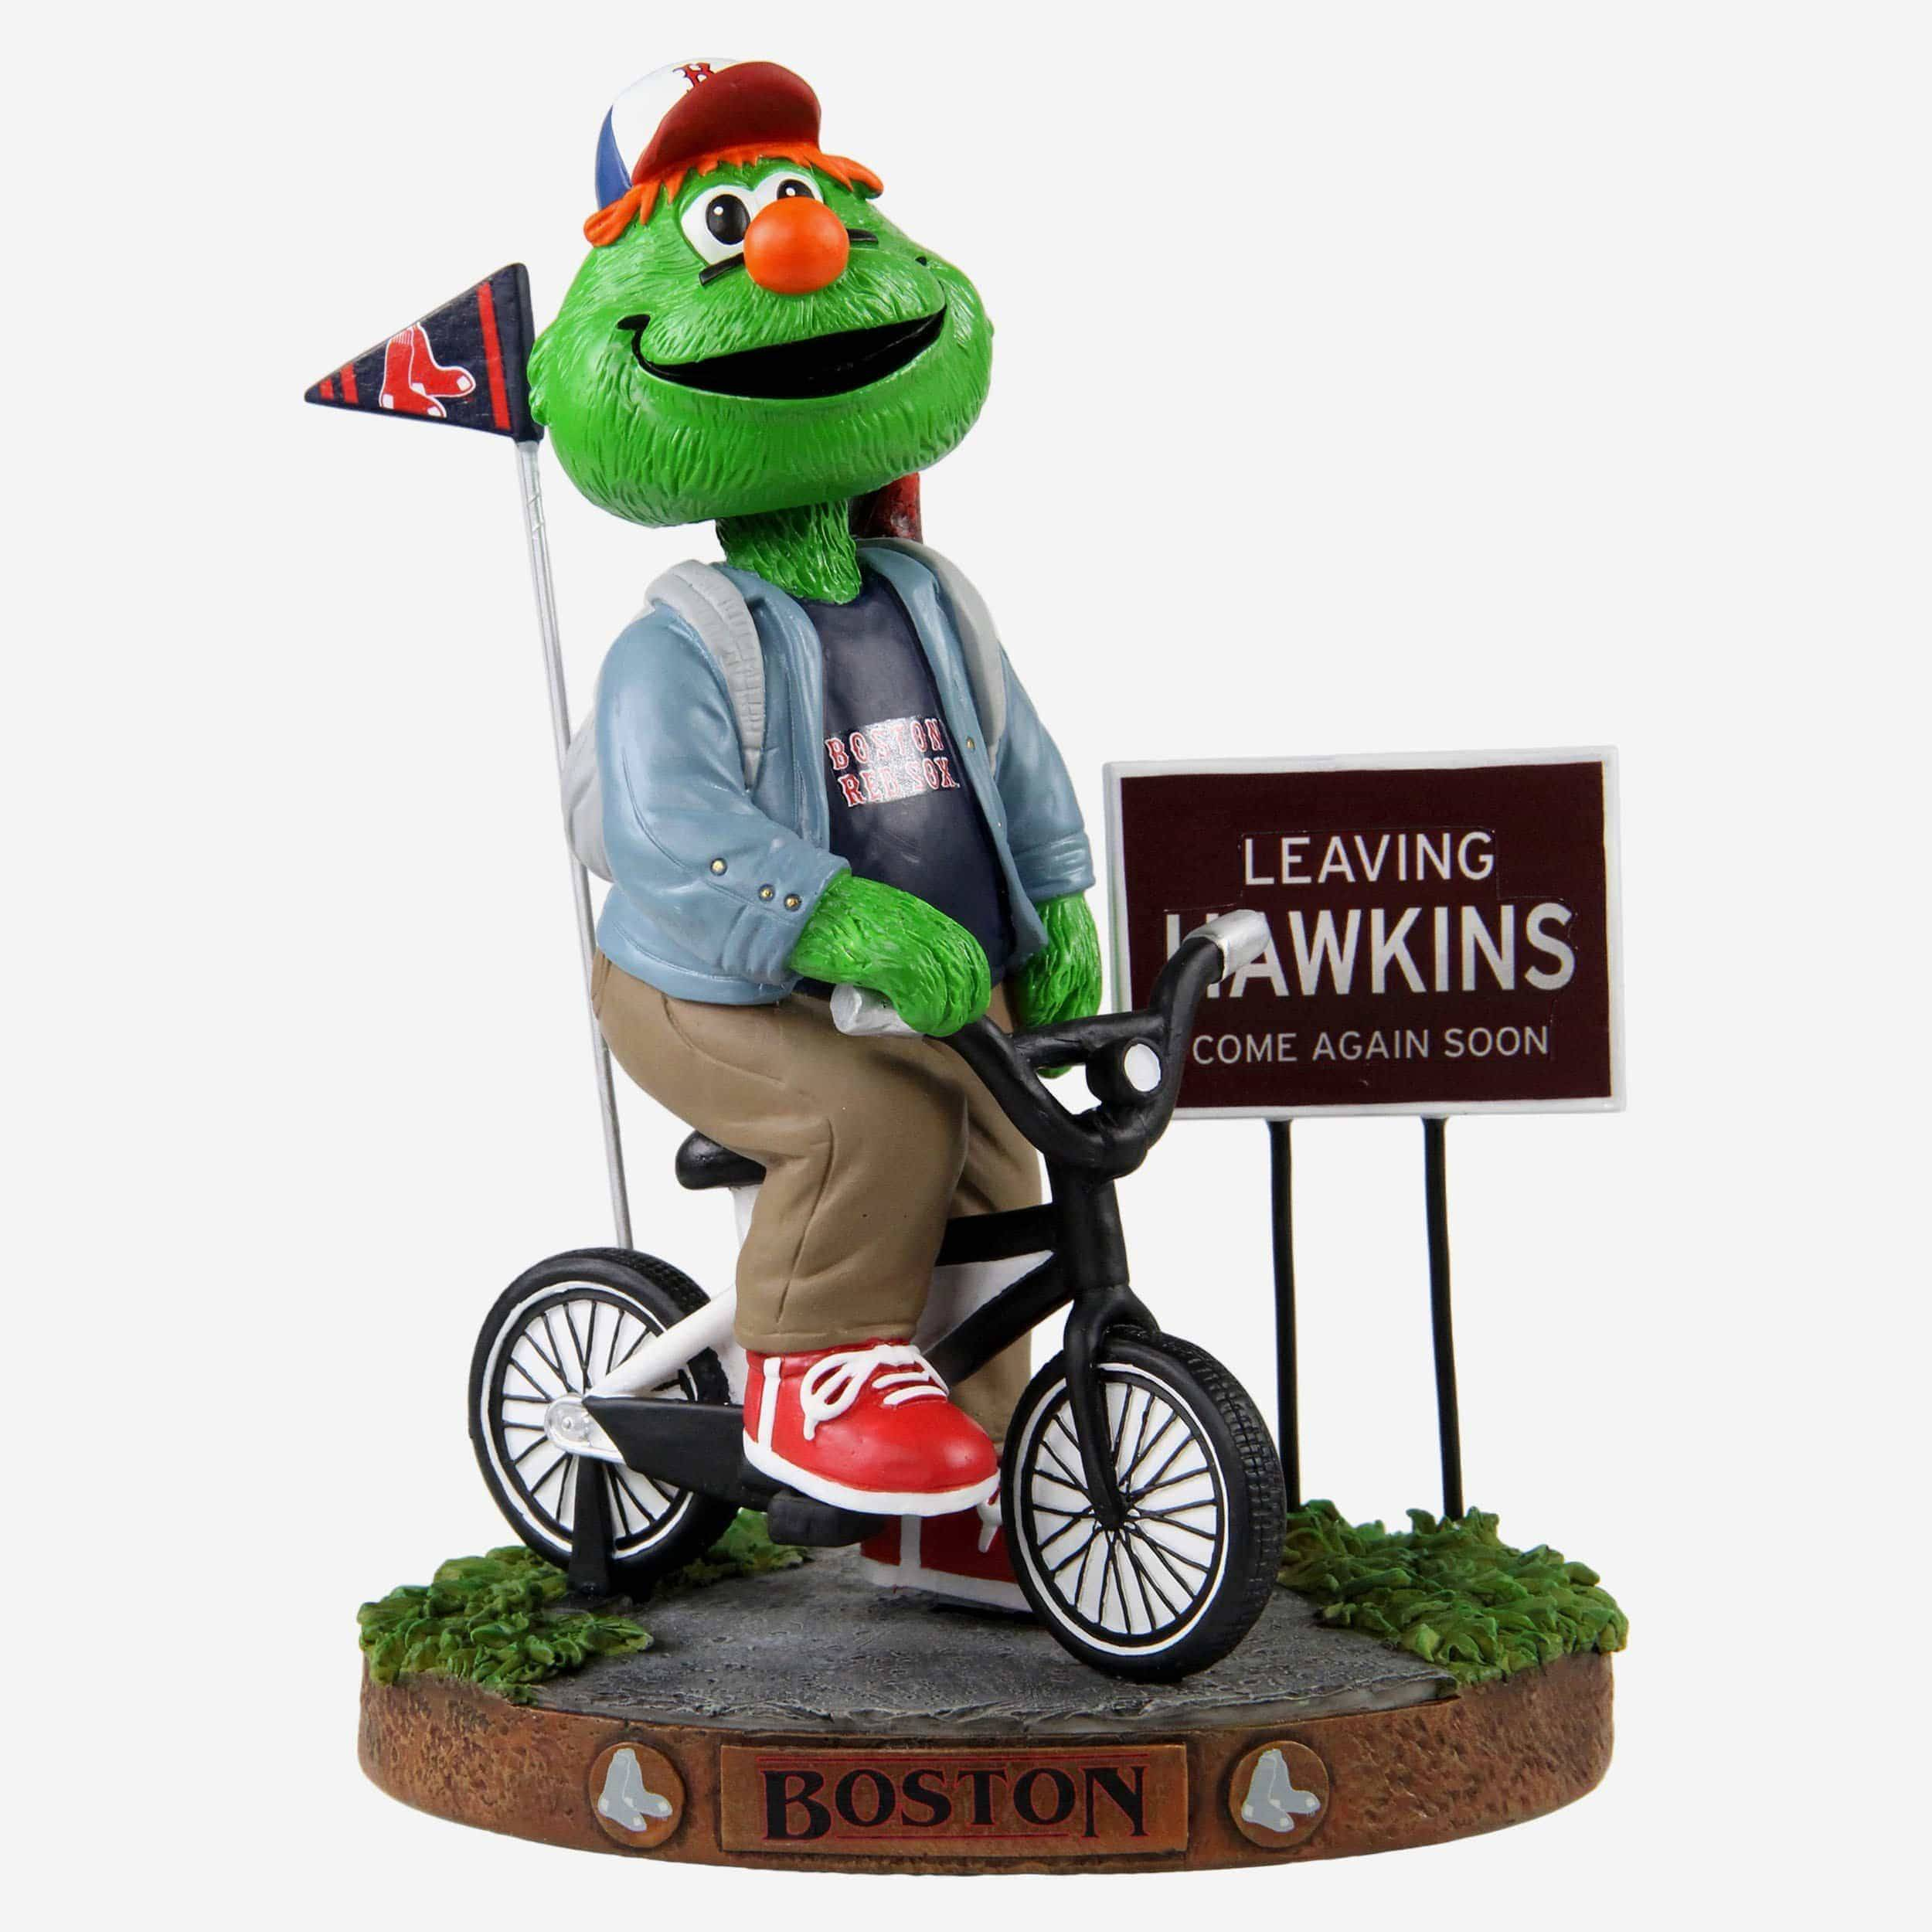 FOCO Wally The Green Monster Boston Red Sox Stranger Things Mascot On Bike Bobblehead